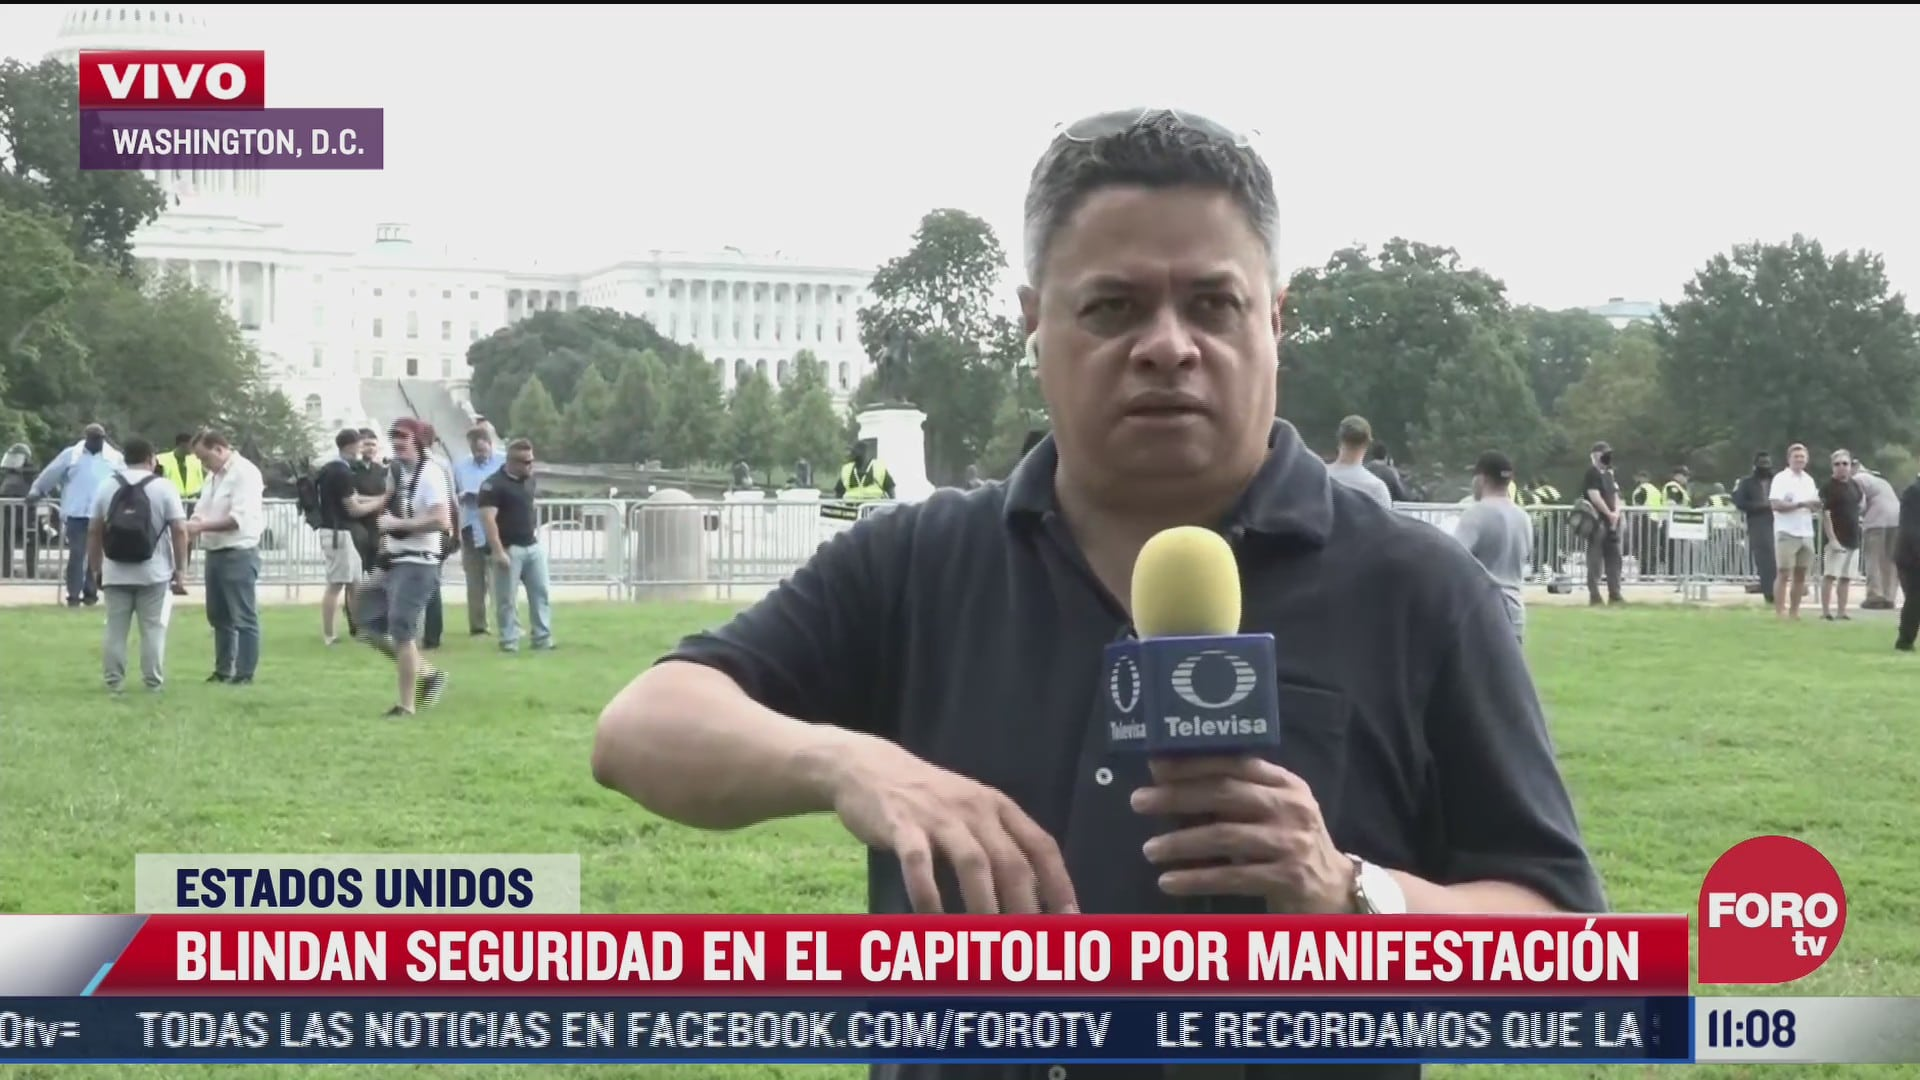 manifestacion en apoyo a acusados por asalto en capitolio